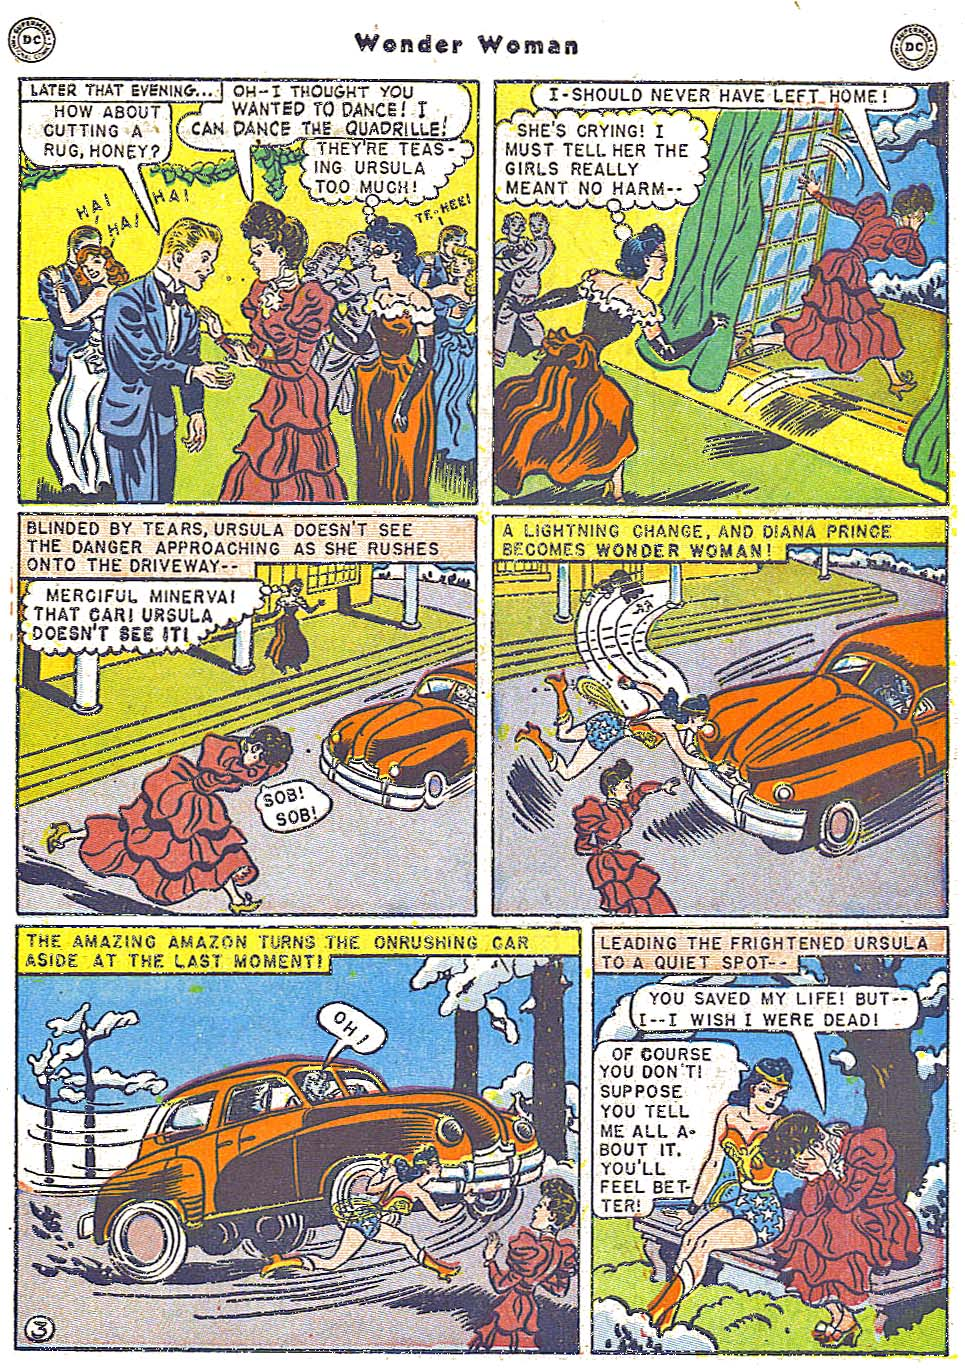 Read online Wonder Woman (1942) comic -  Issue #38 - 5